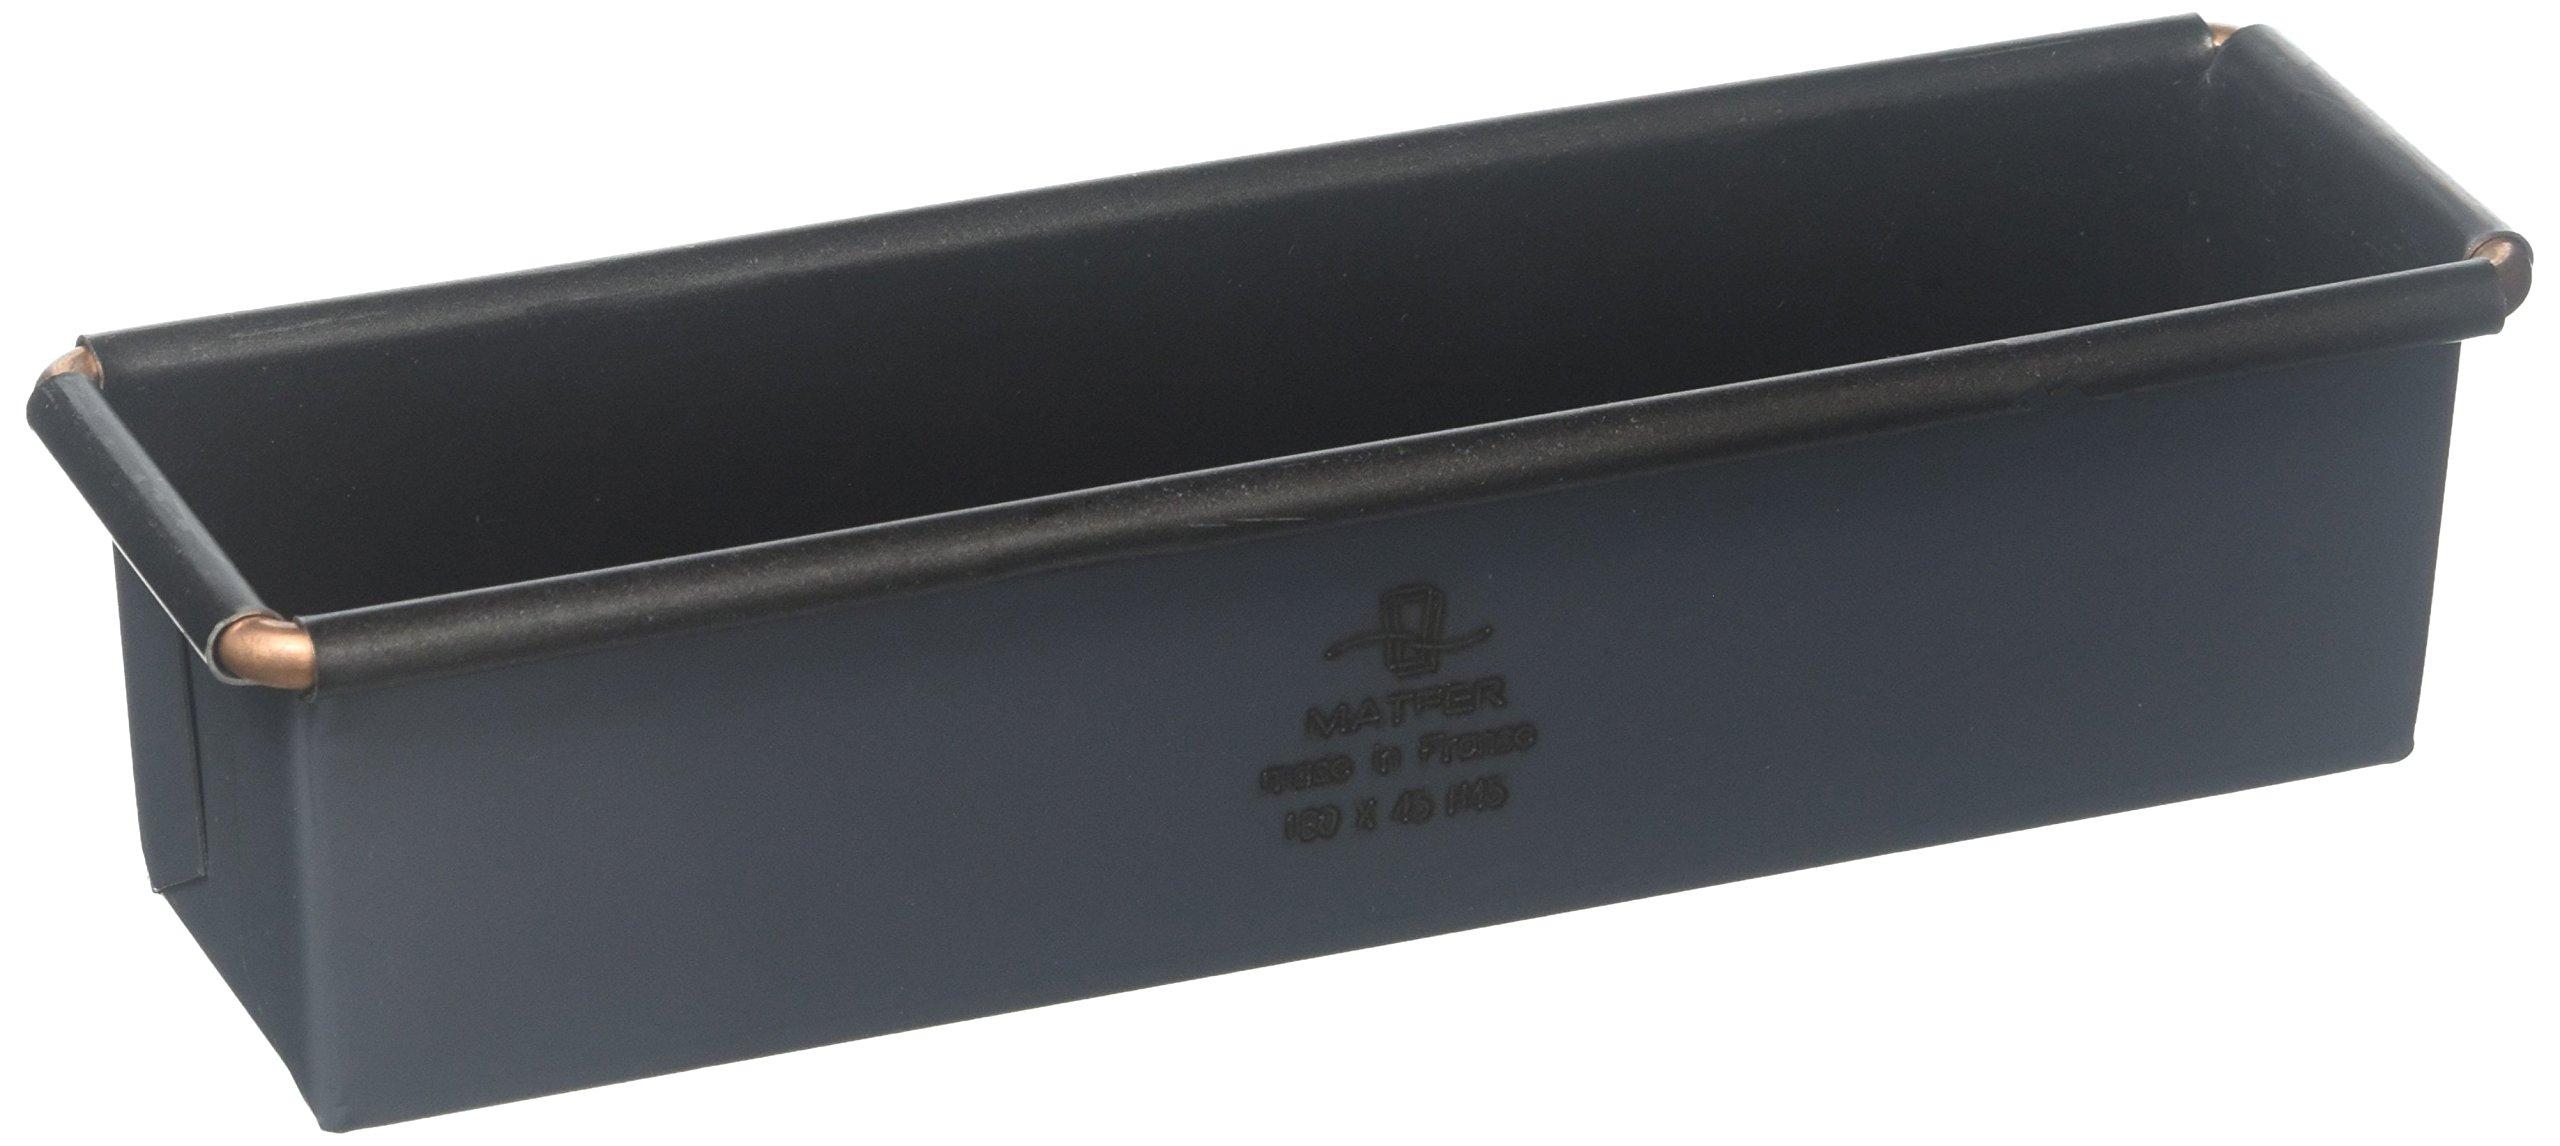 Matfer Bourgeat Exopan Steel Non-Stick Mini Loaf Mold, Black